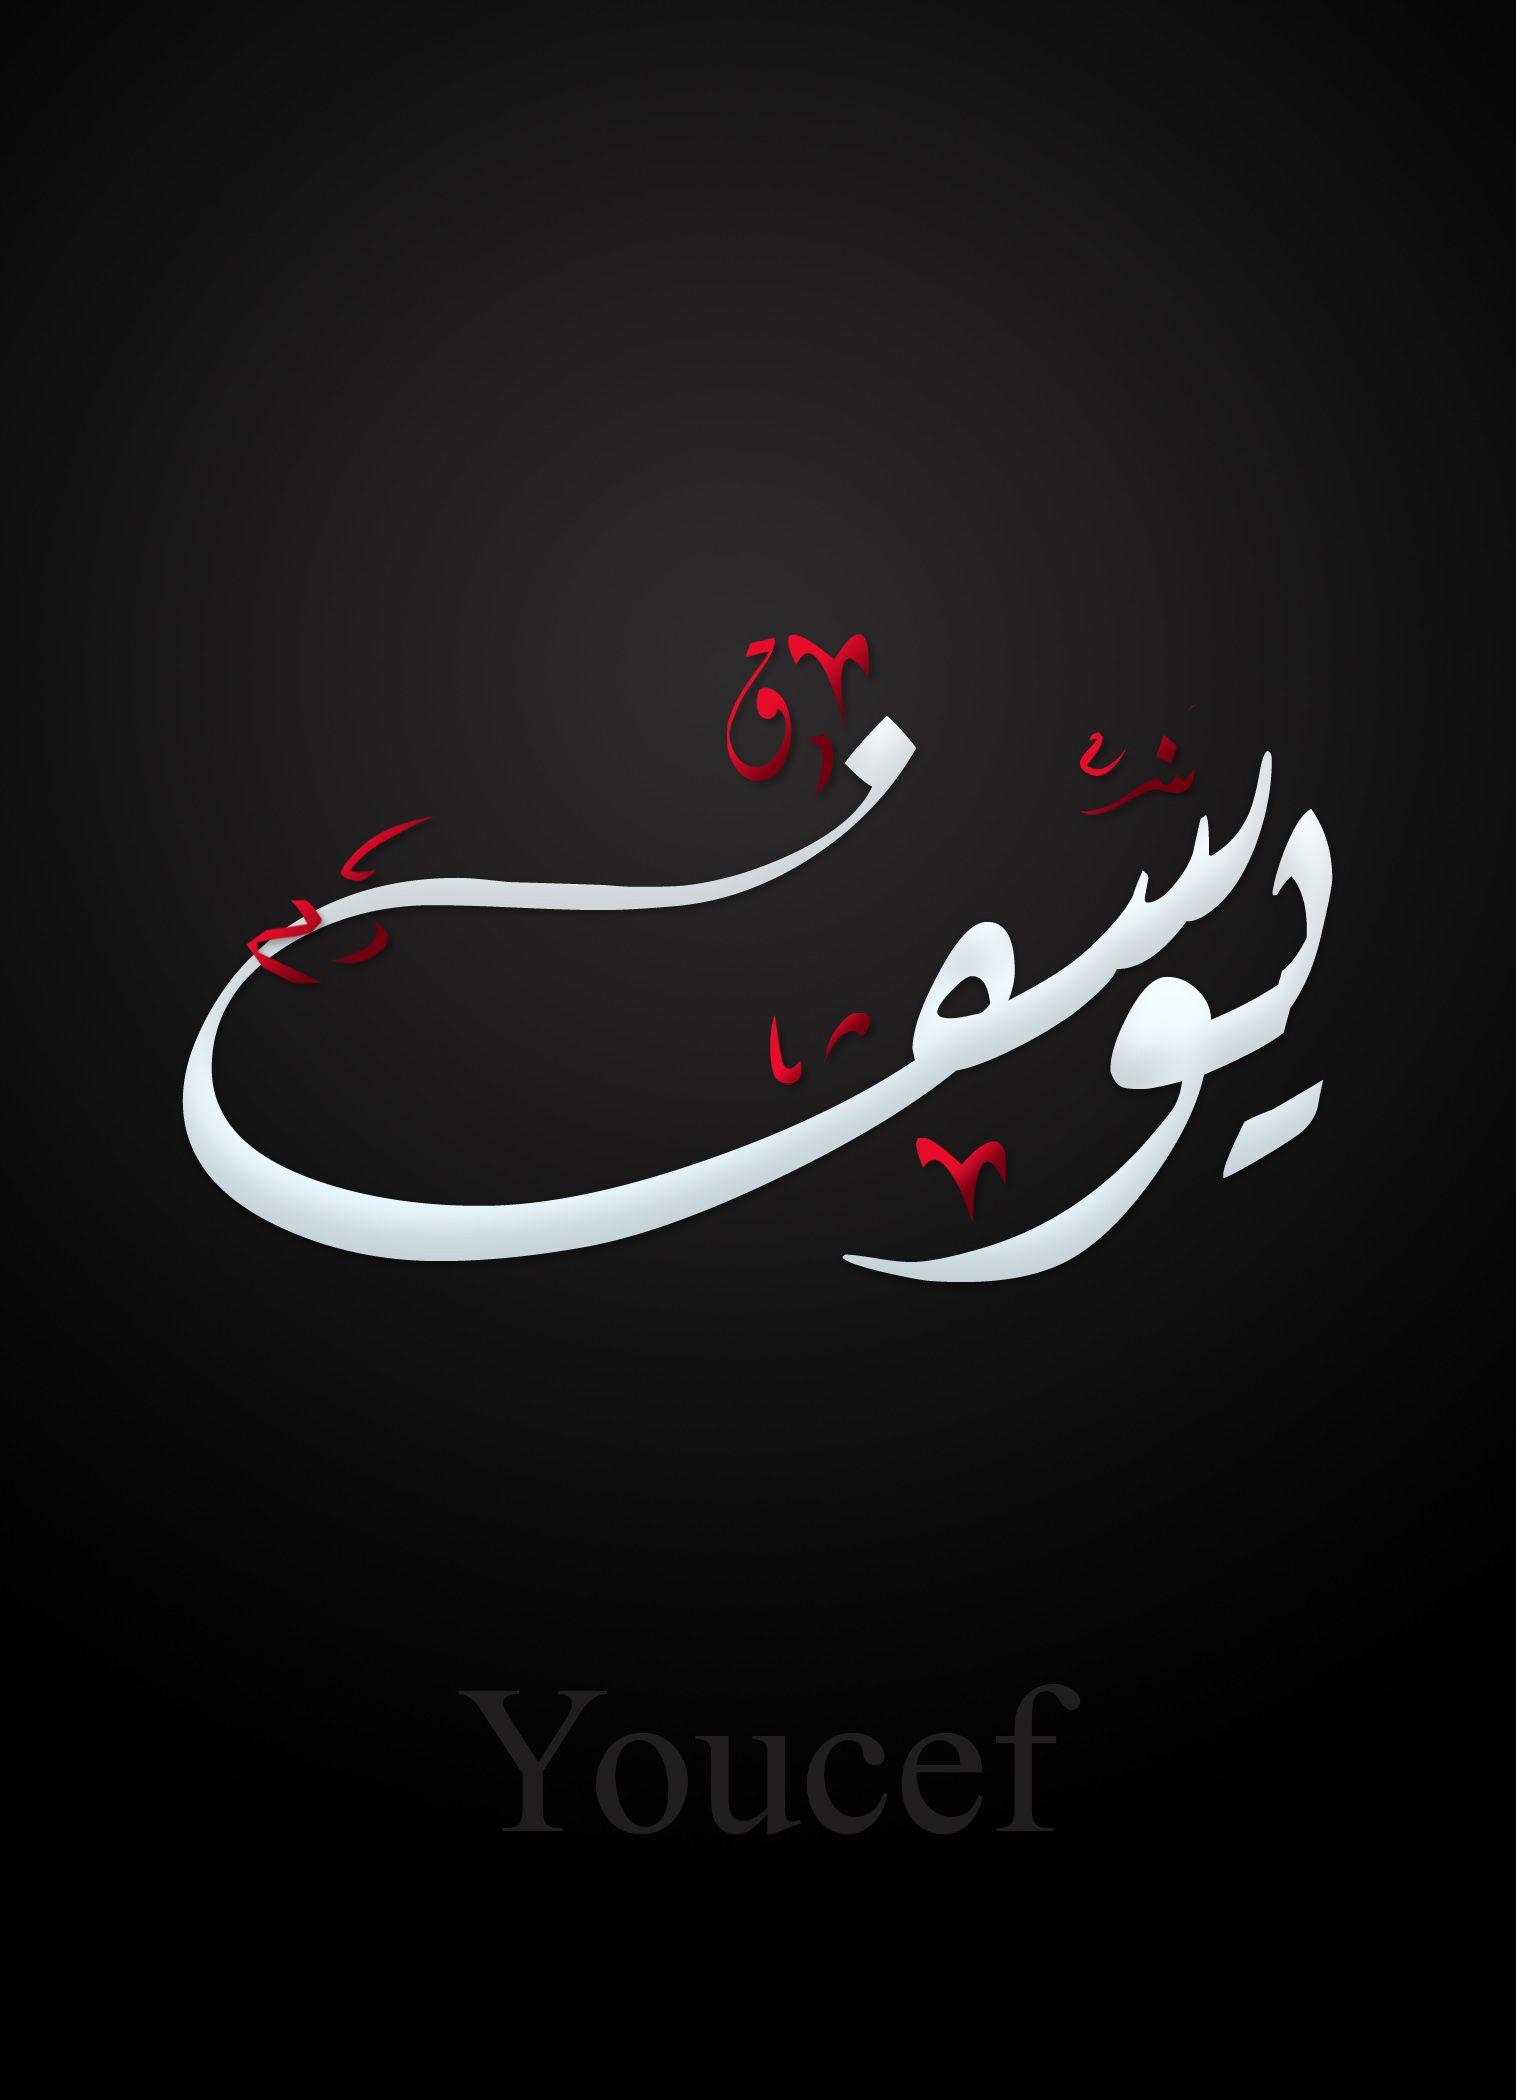 Youcef يوسف Iphone Wallpaper Quotes Love Arabic Calligraphy Art Calligraphy Logo